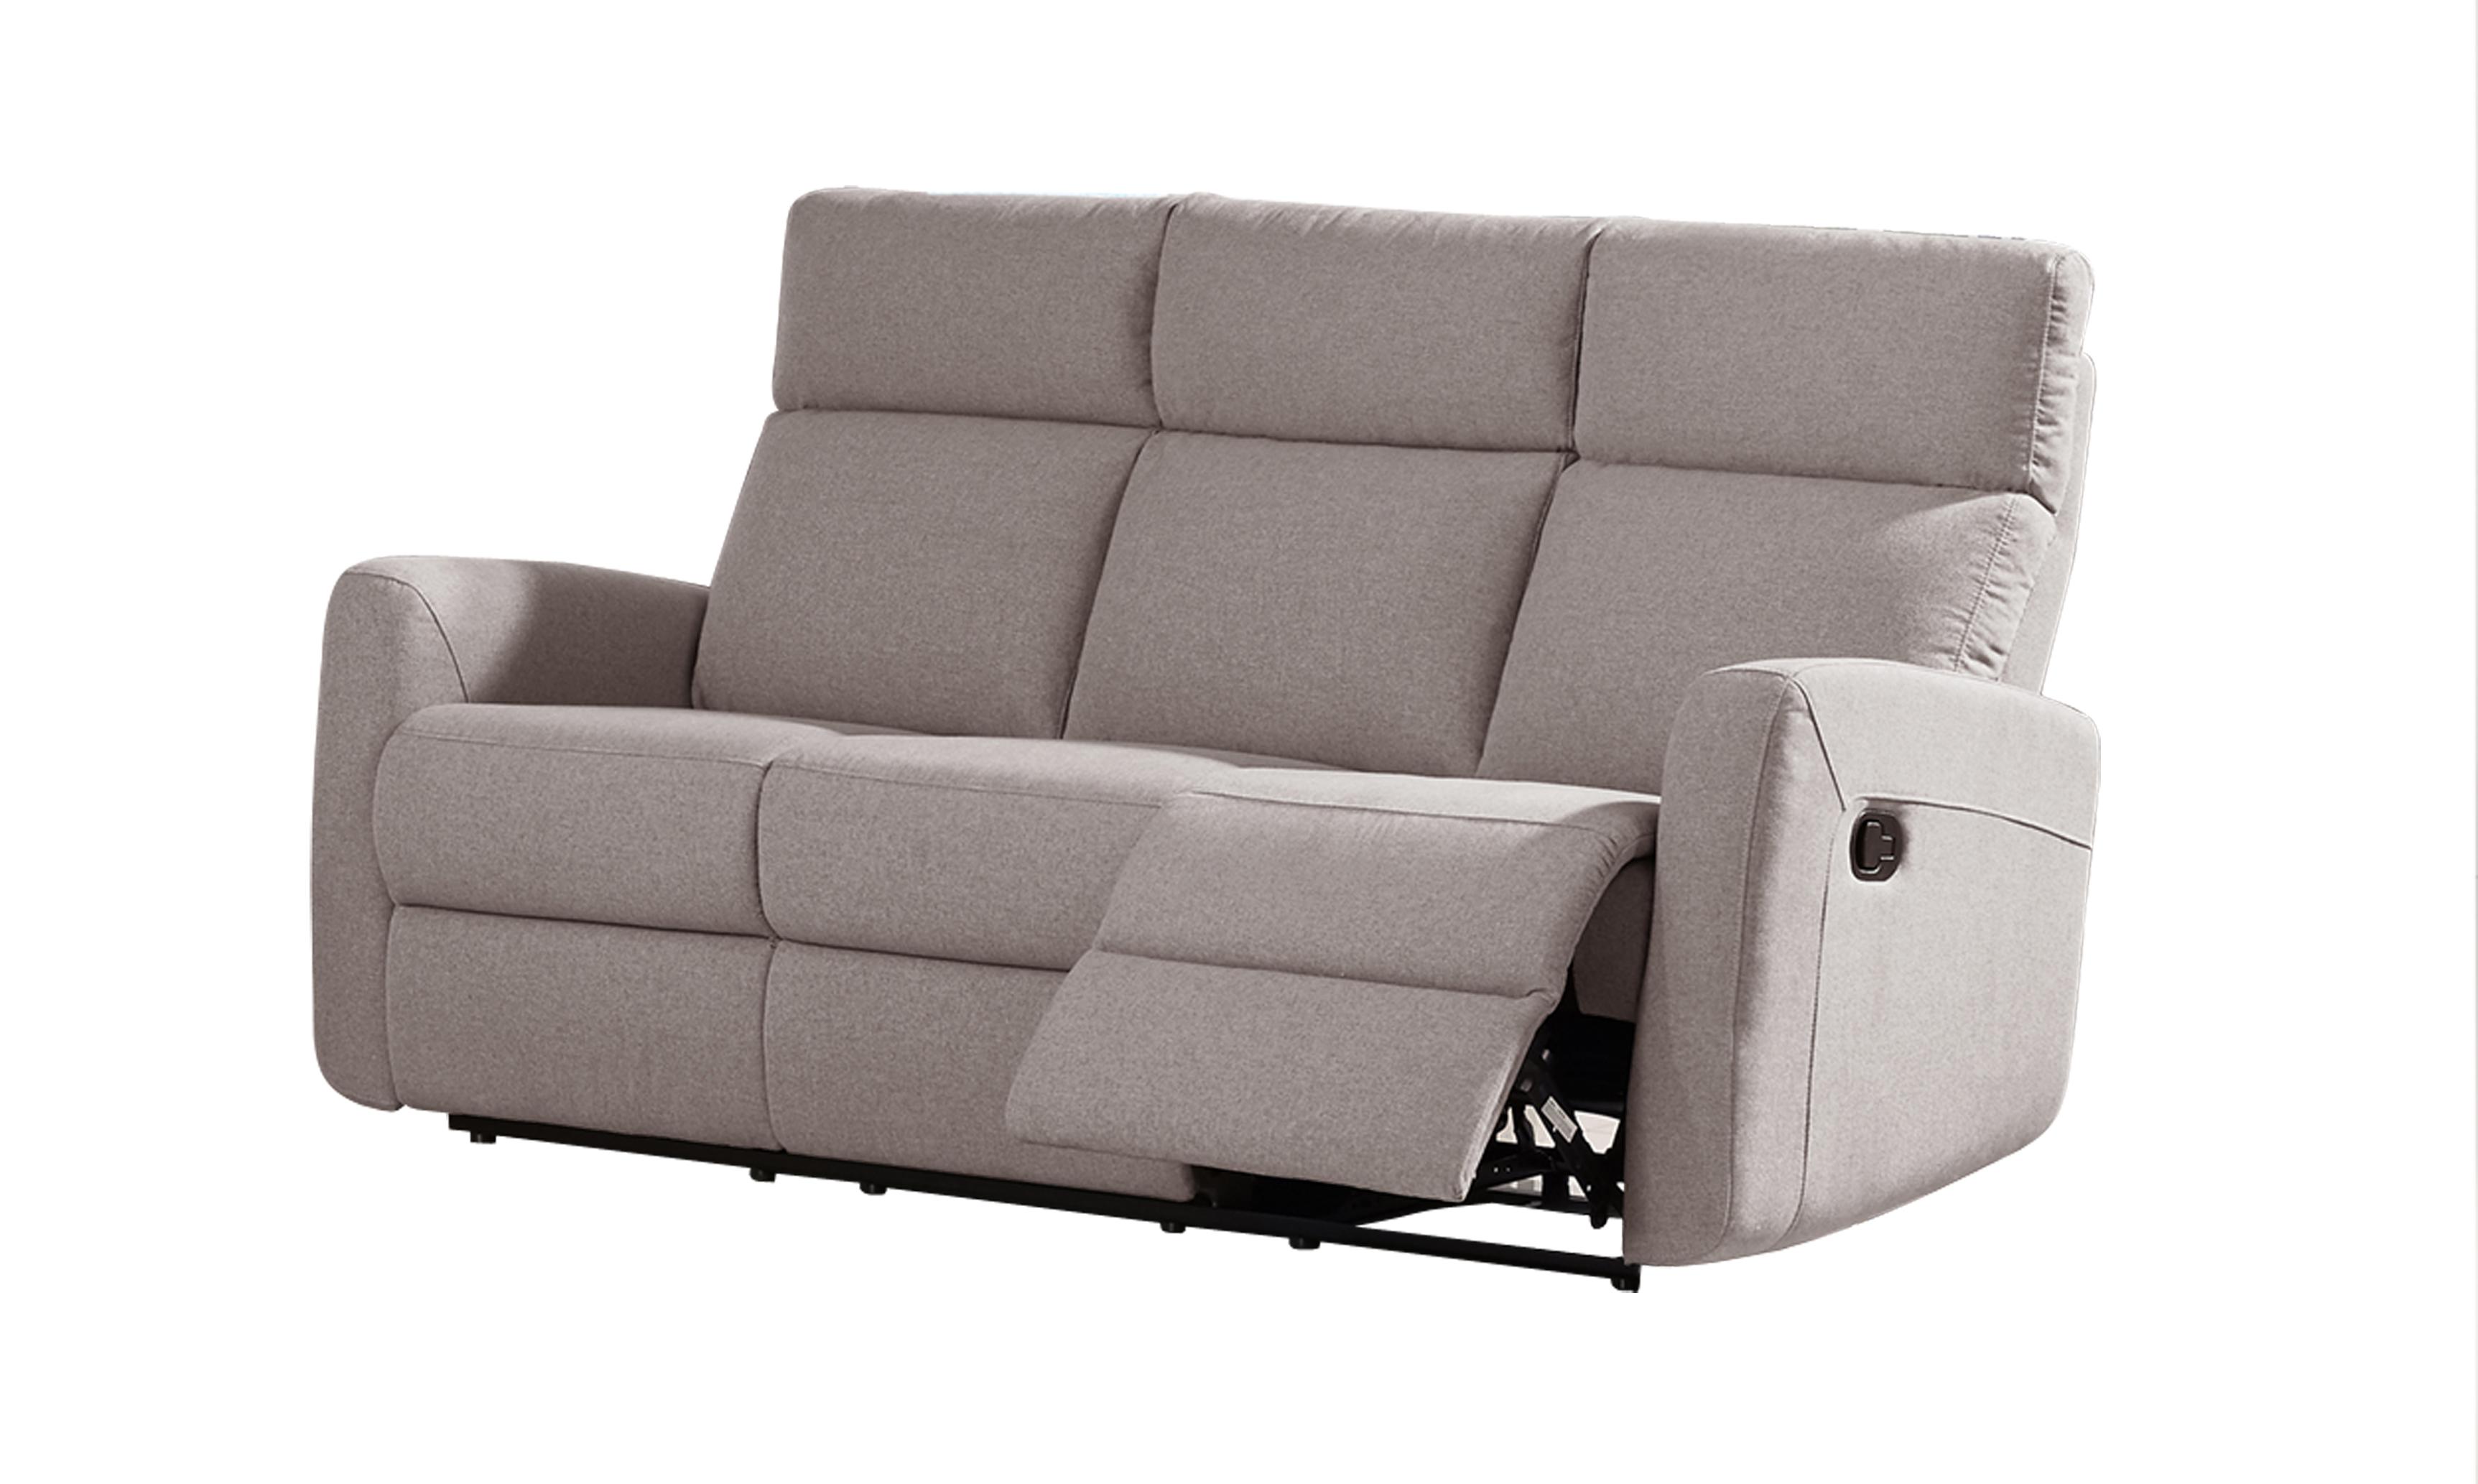 Victoria Reclining Sofa Fabric Code K30 Light Grey